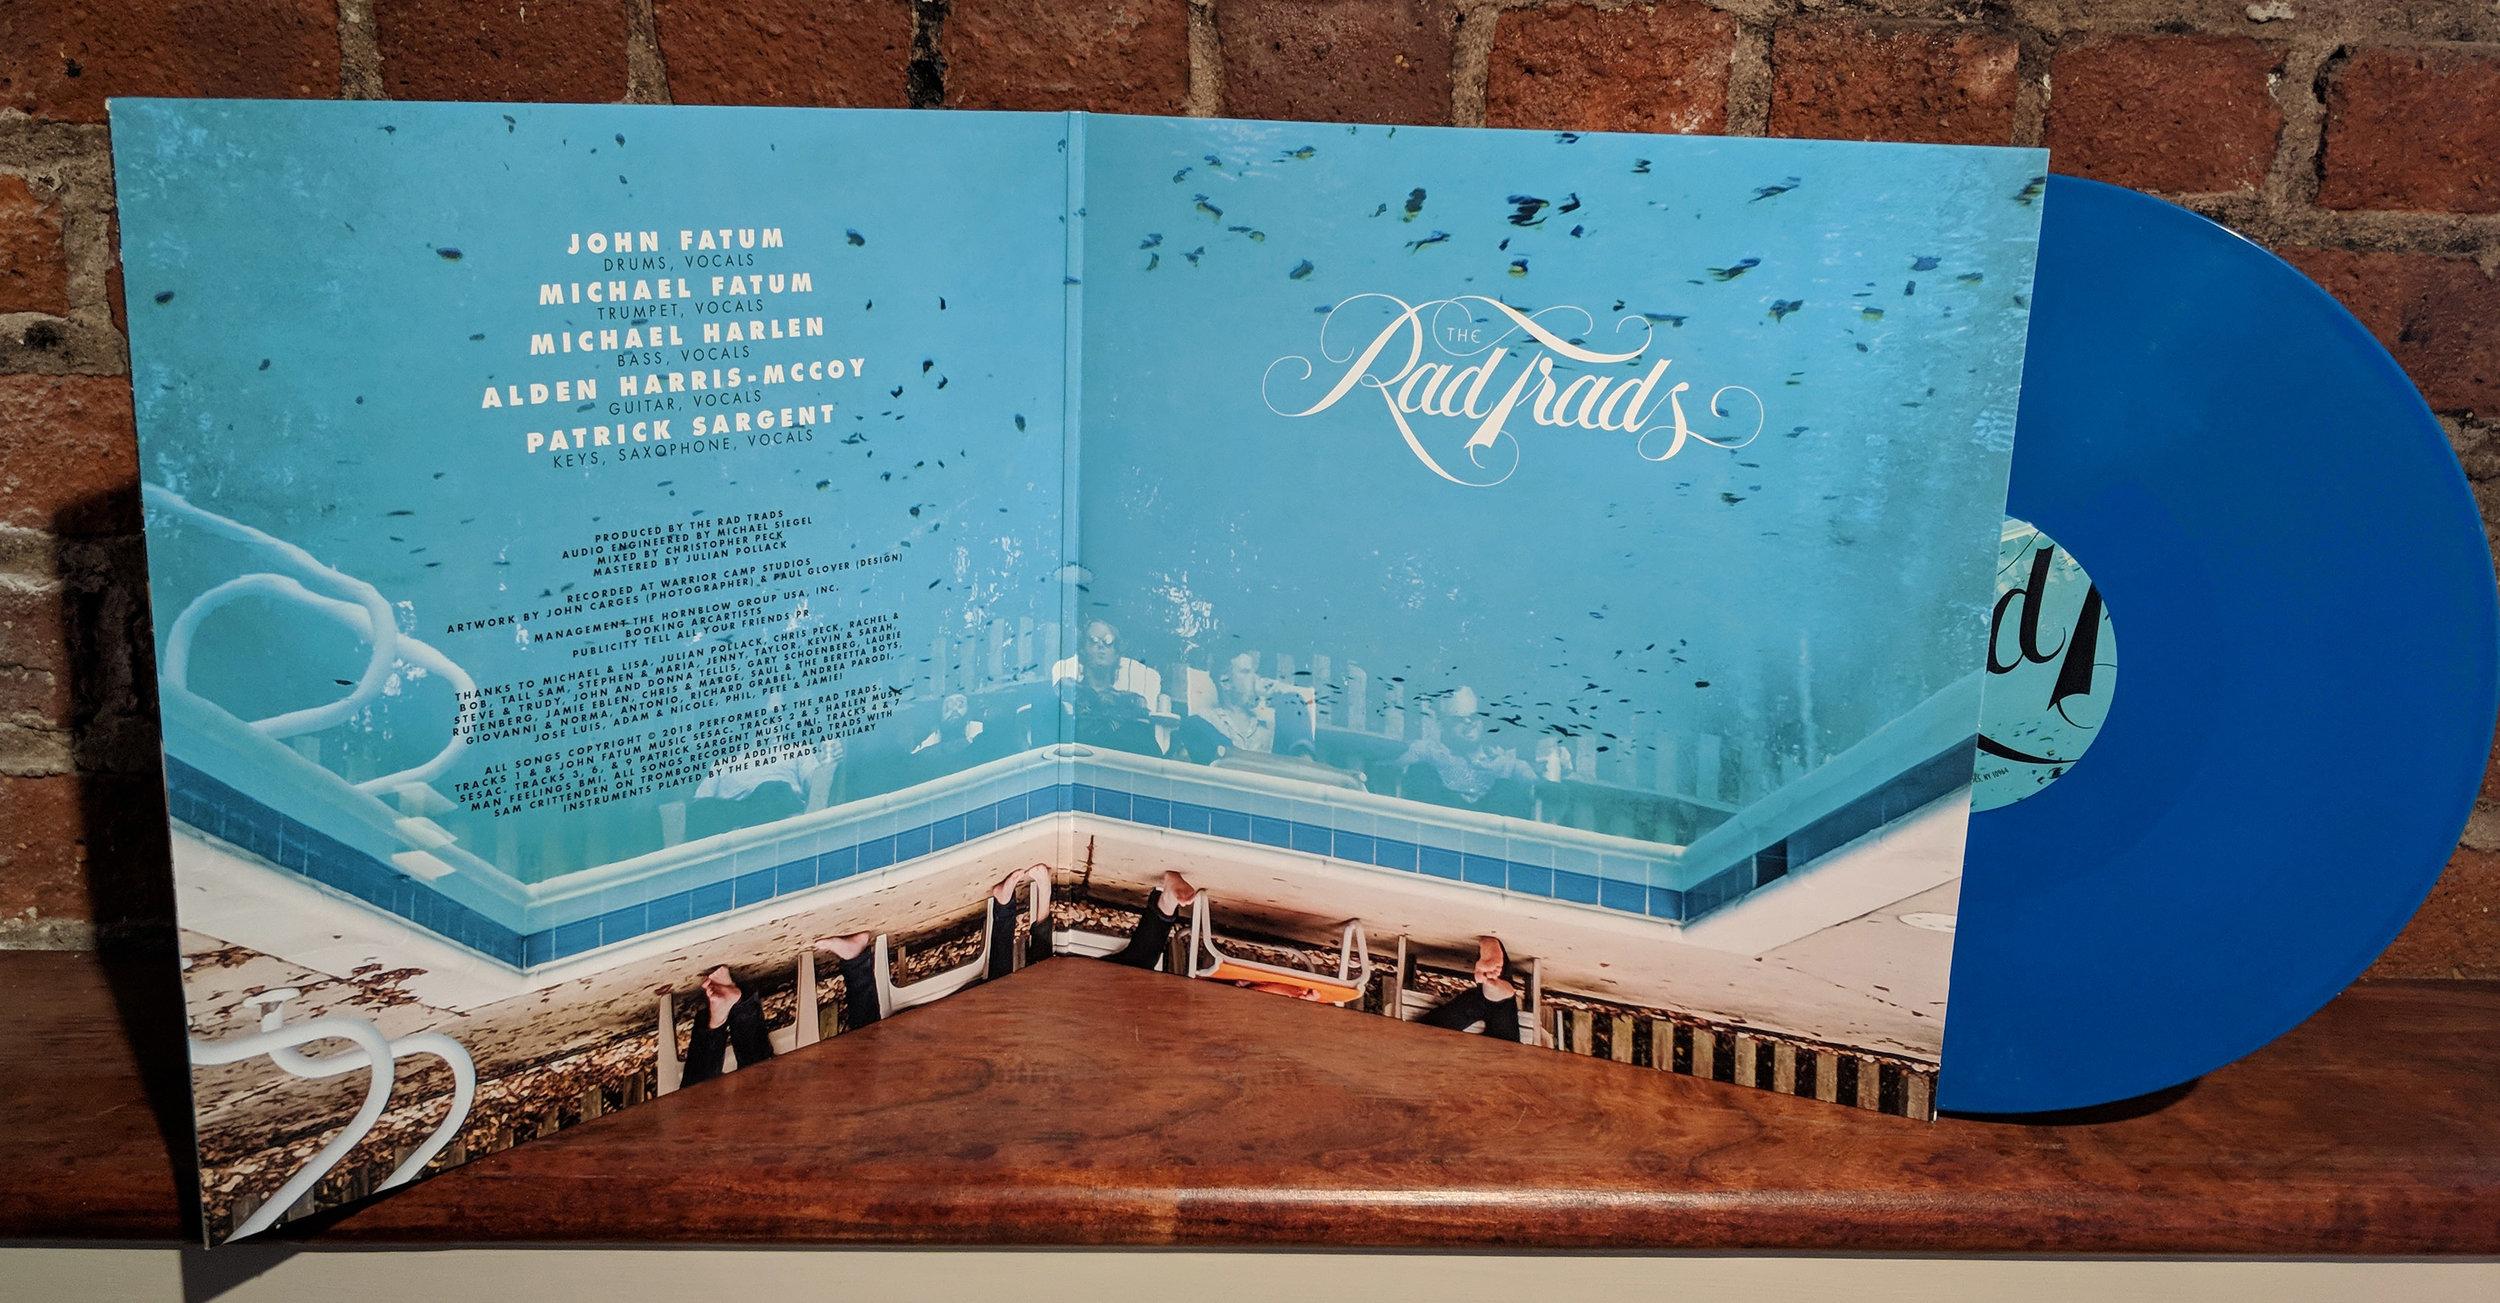 On Tap Vinyl (Limited Edition Aqua) — The Rad Trads